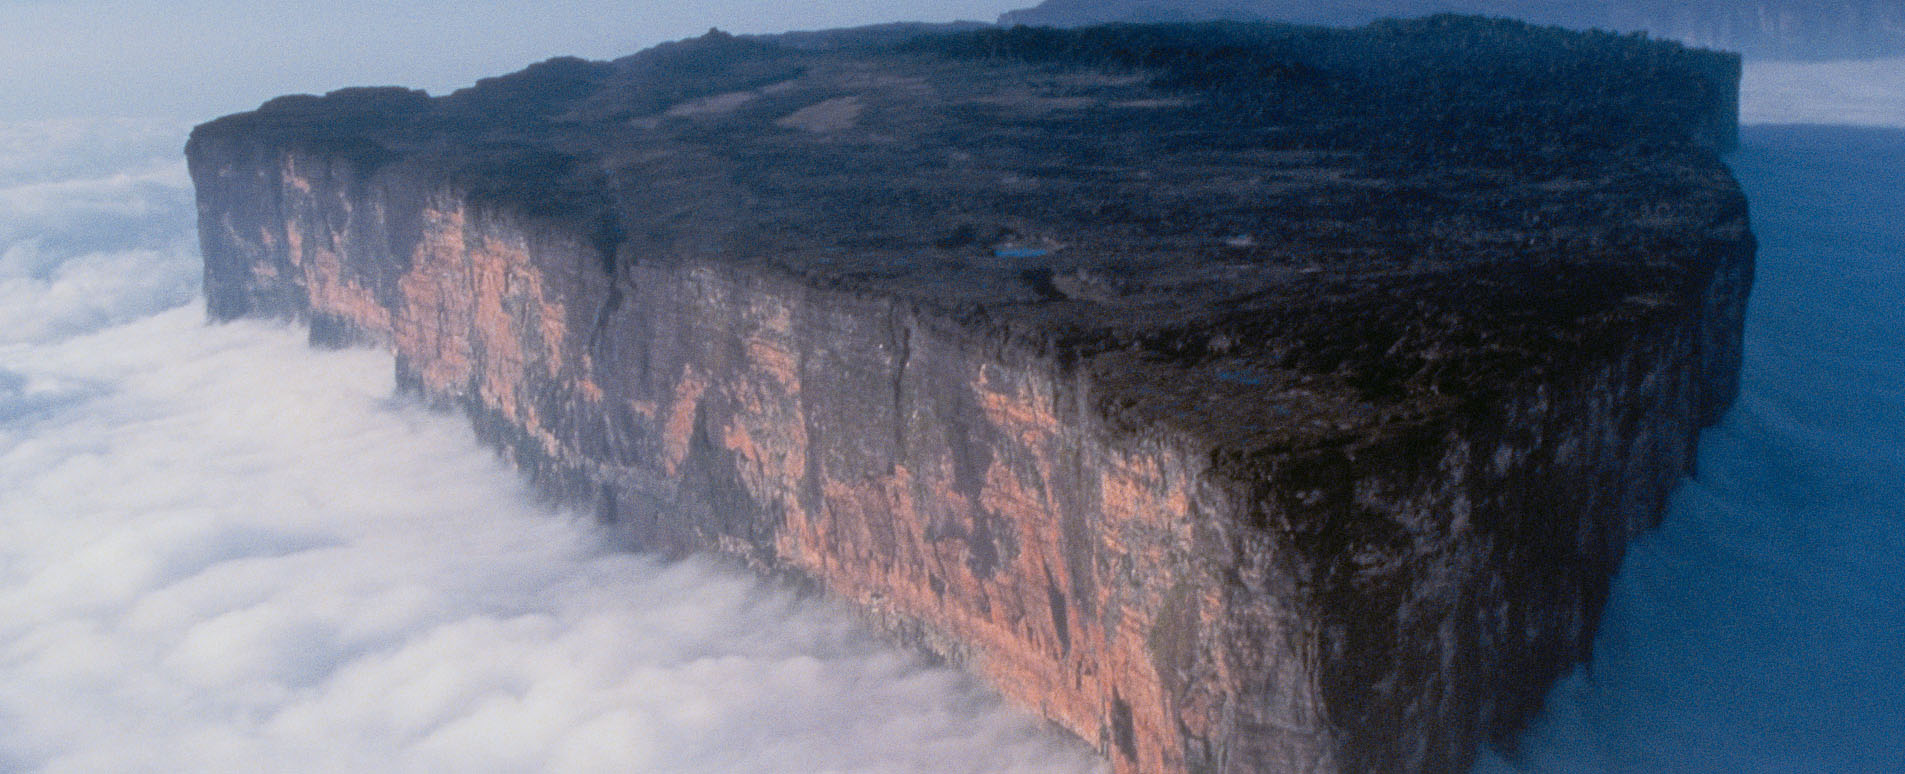 Visit the Gran Sabana - Venezuela Travel Guide|Geodyssey